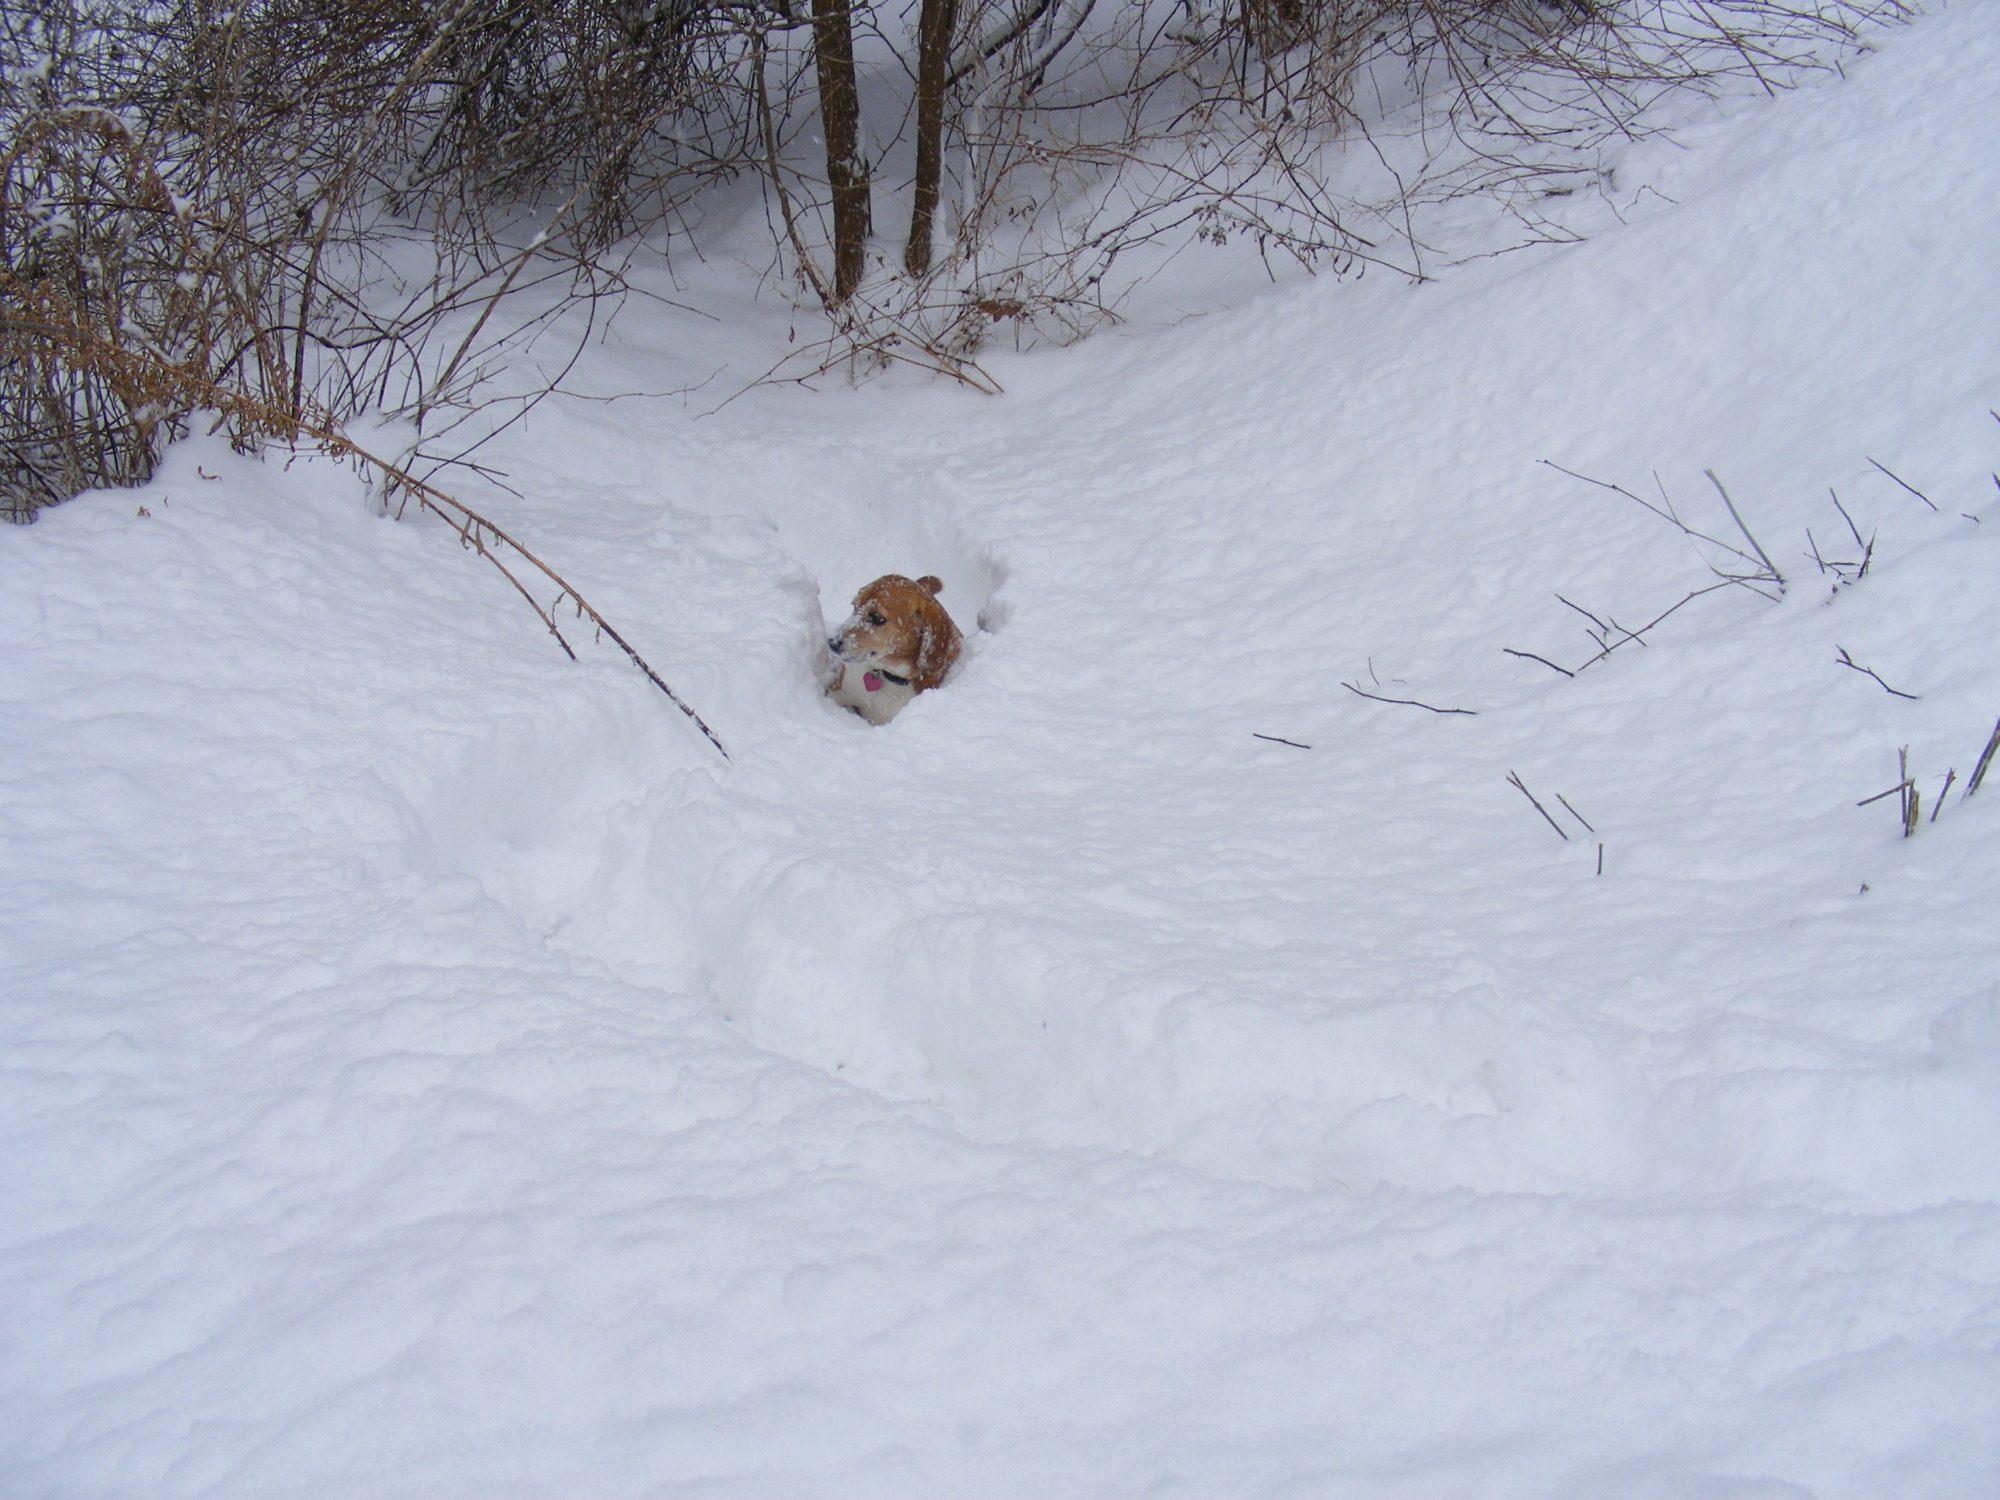 ummm...i'm stuck Mum, help please!